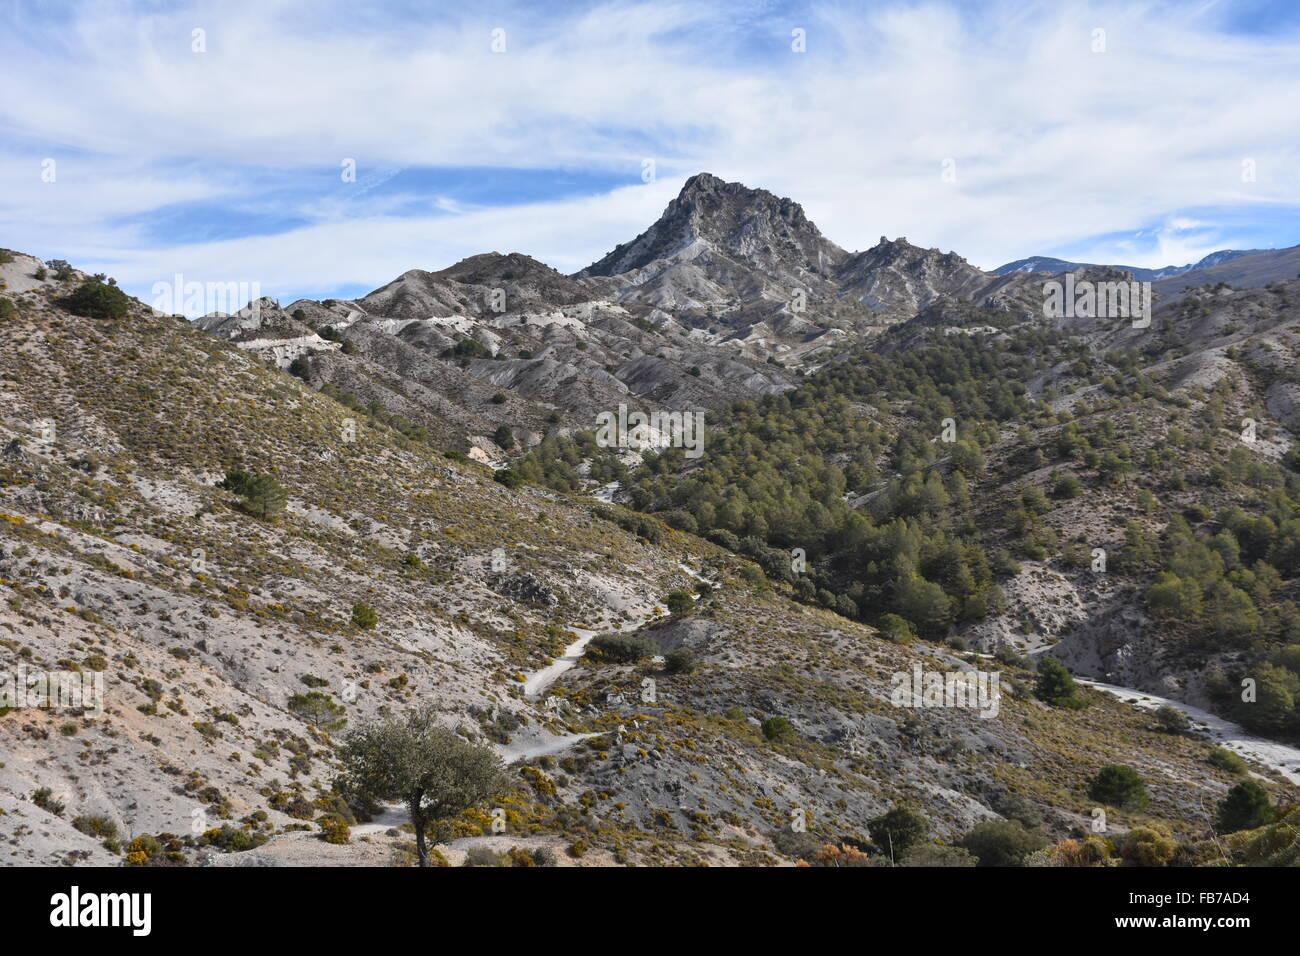 Trevenque, Andalucia, Spain - Stock Image